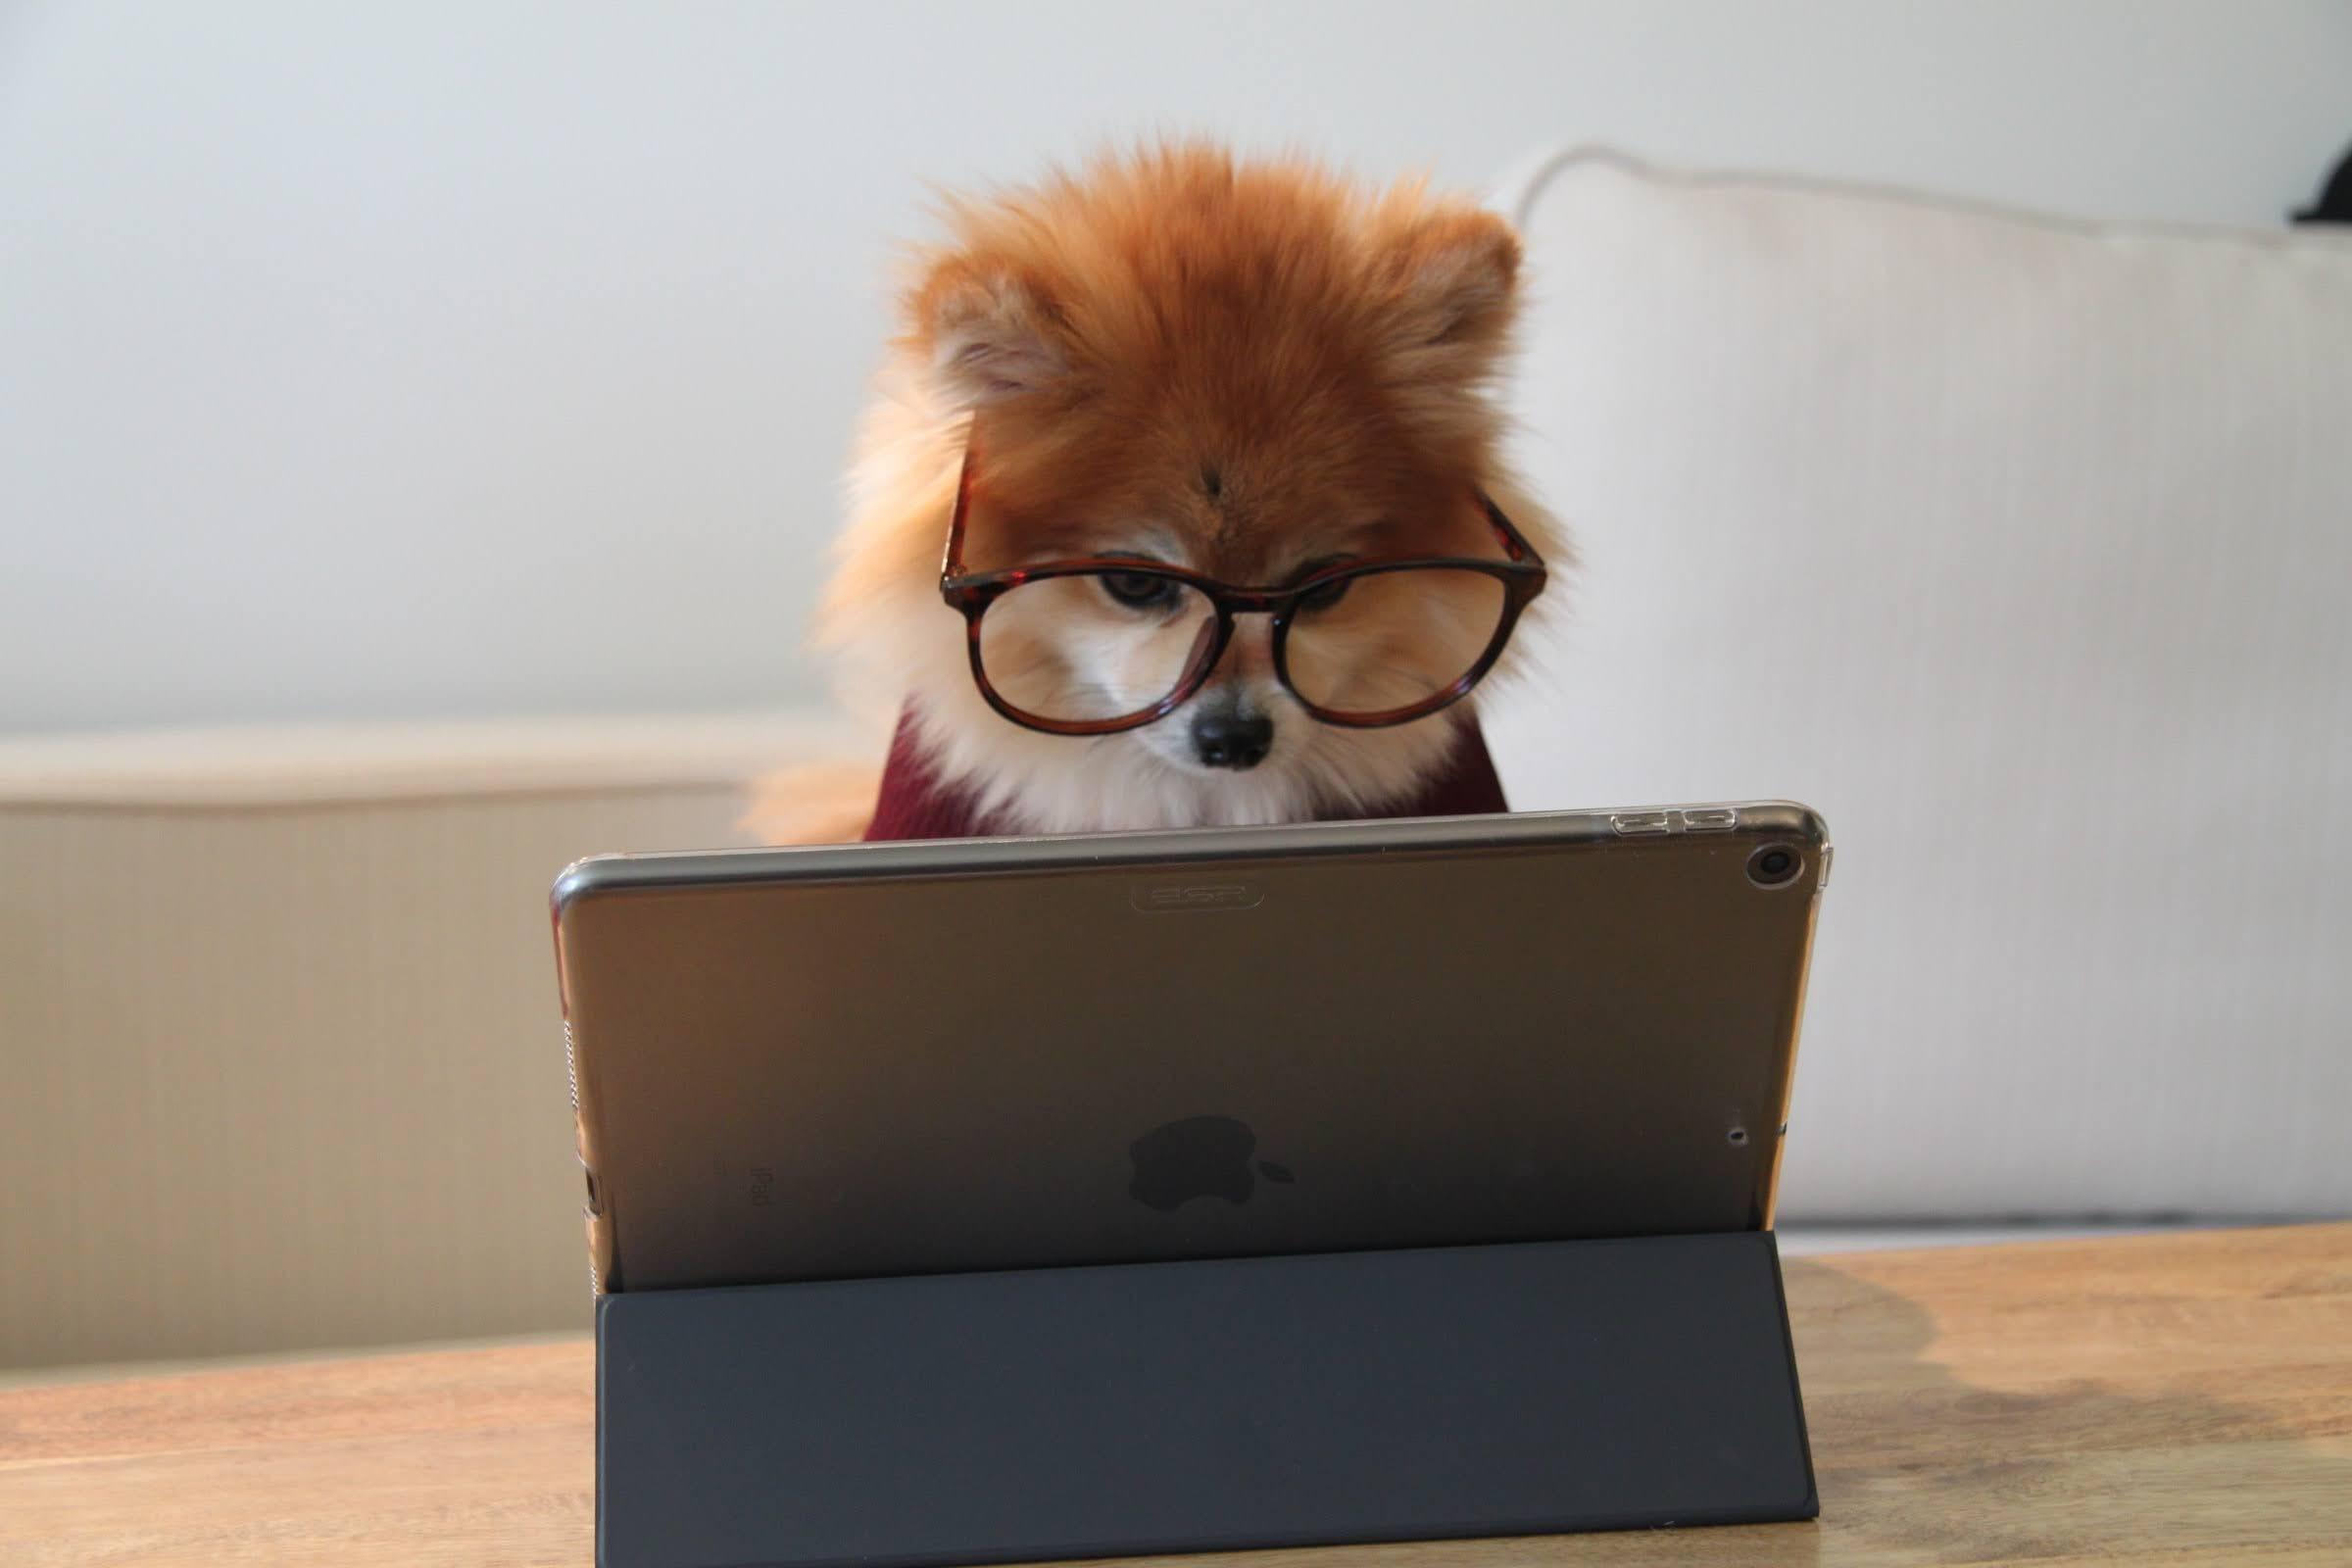 Pomeranian working on an iPad | Photo by Cookie the Pom via Unsplash